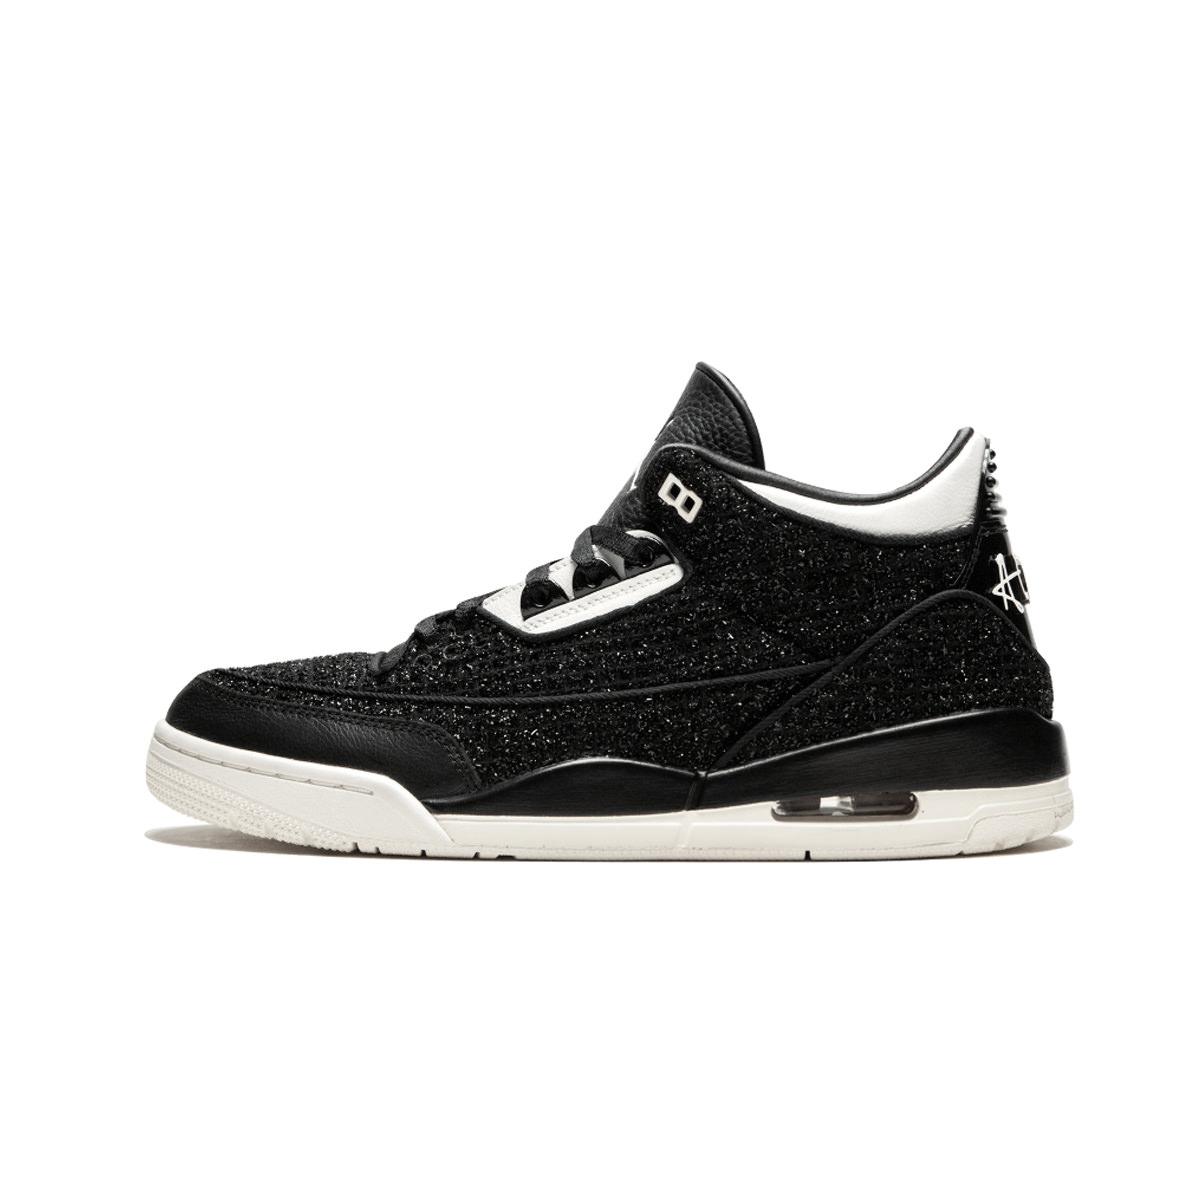 brand new 039f7 f99c6 The Vogue x Air Jordan 3 Awok Black For Women - OFour